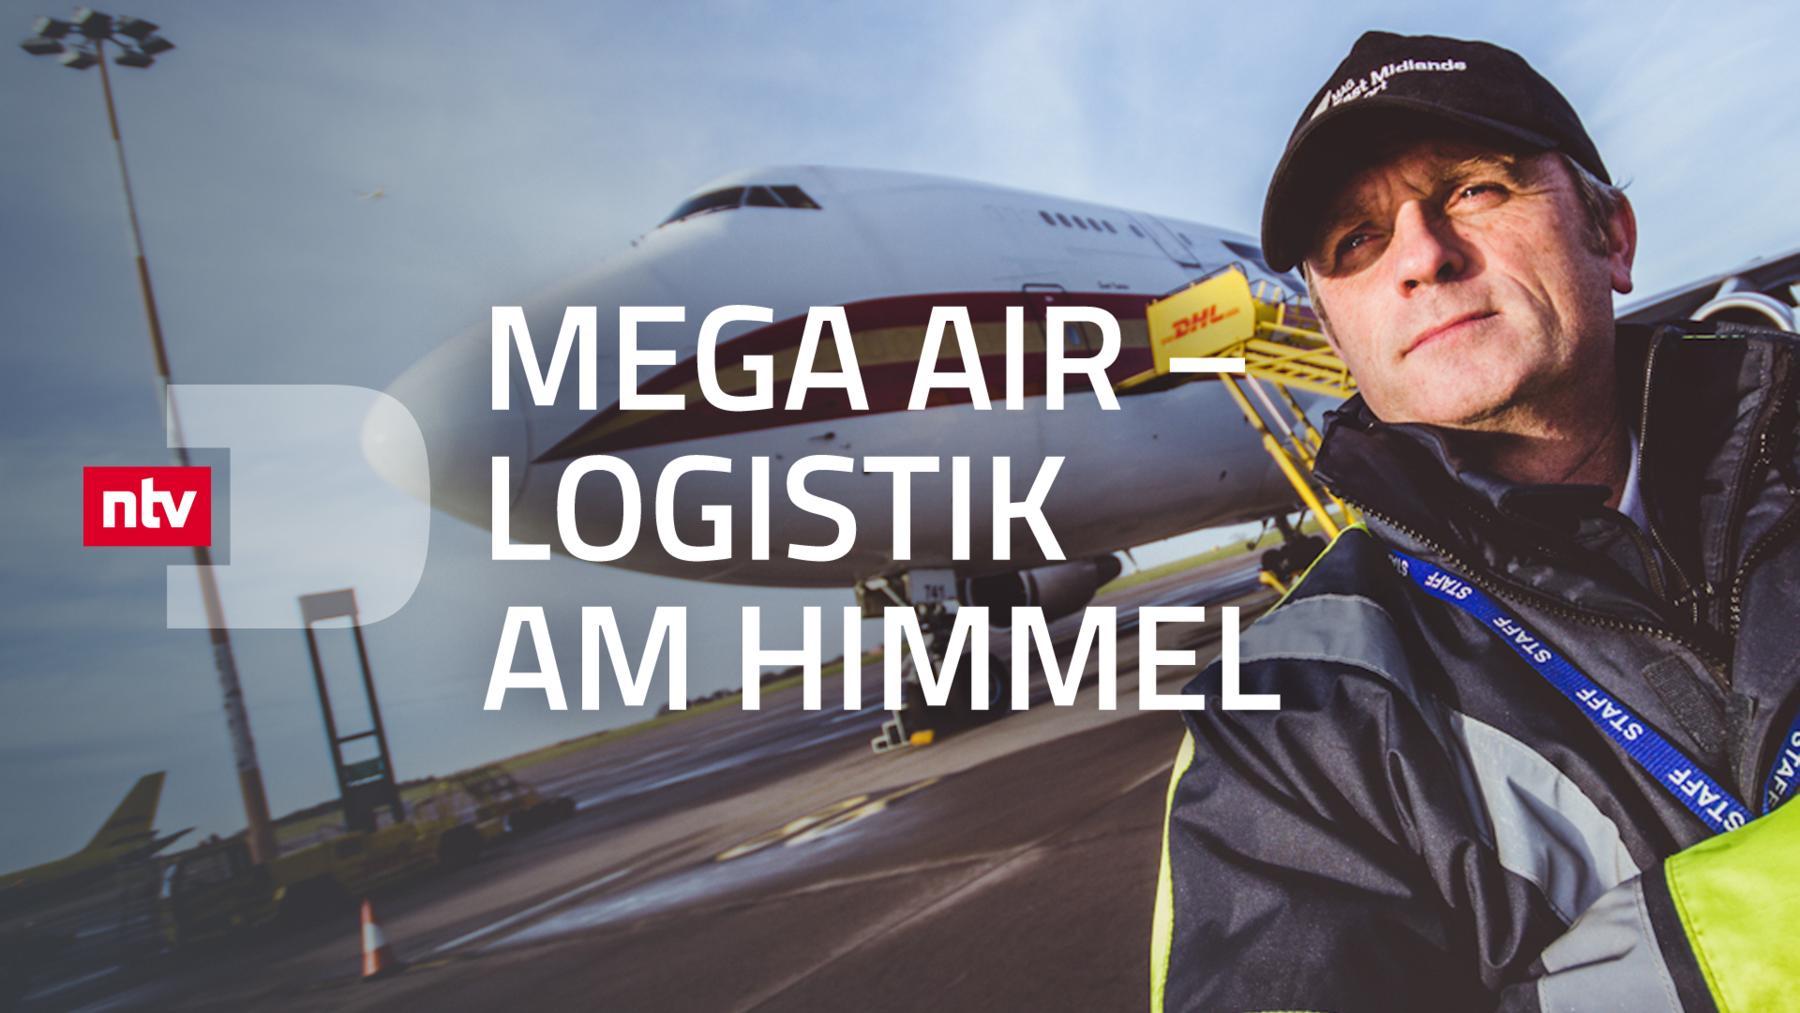 Mega Air - Logistik am Himmel